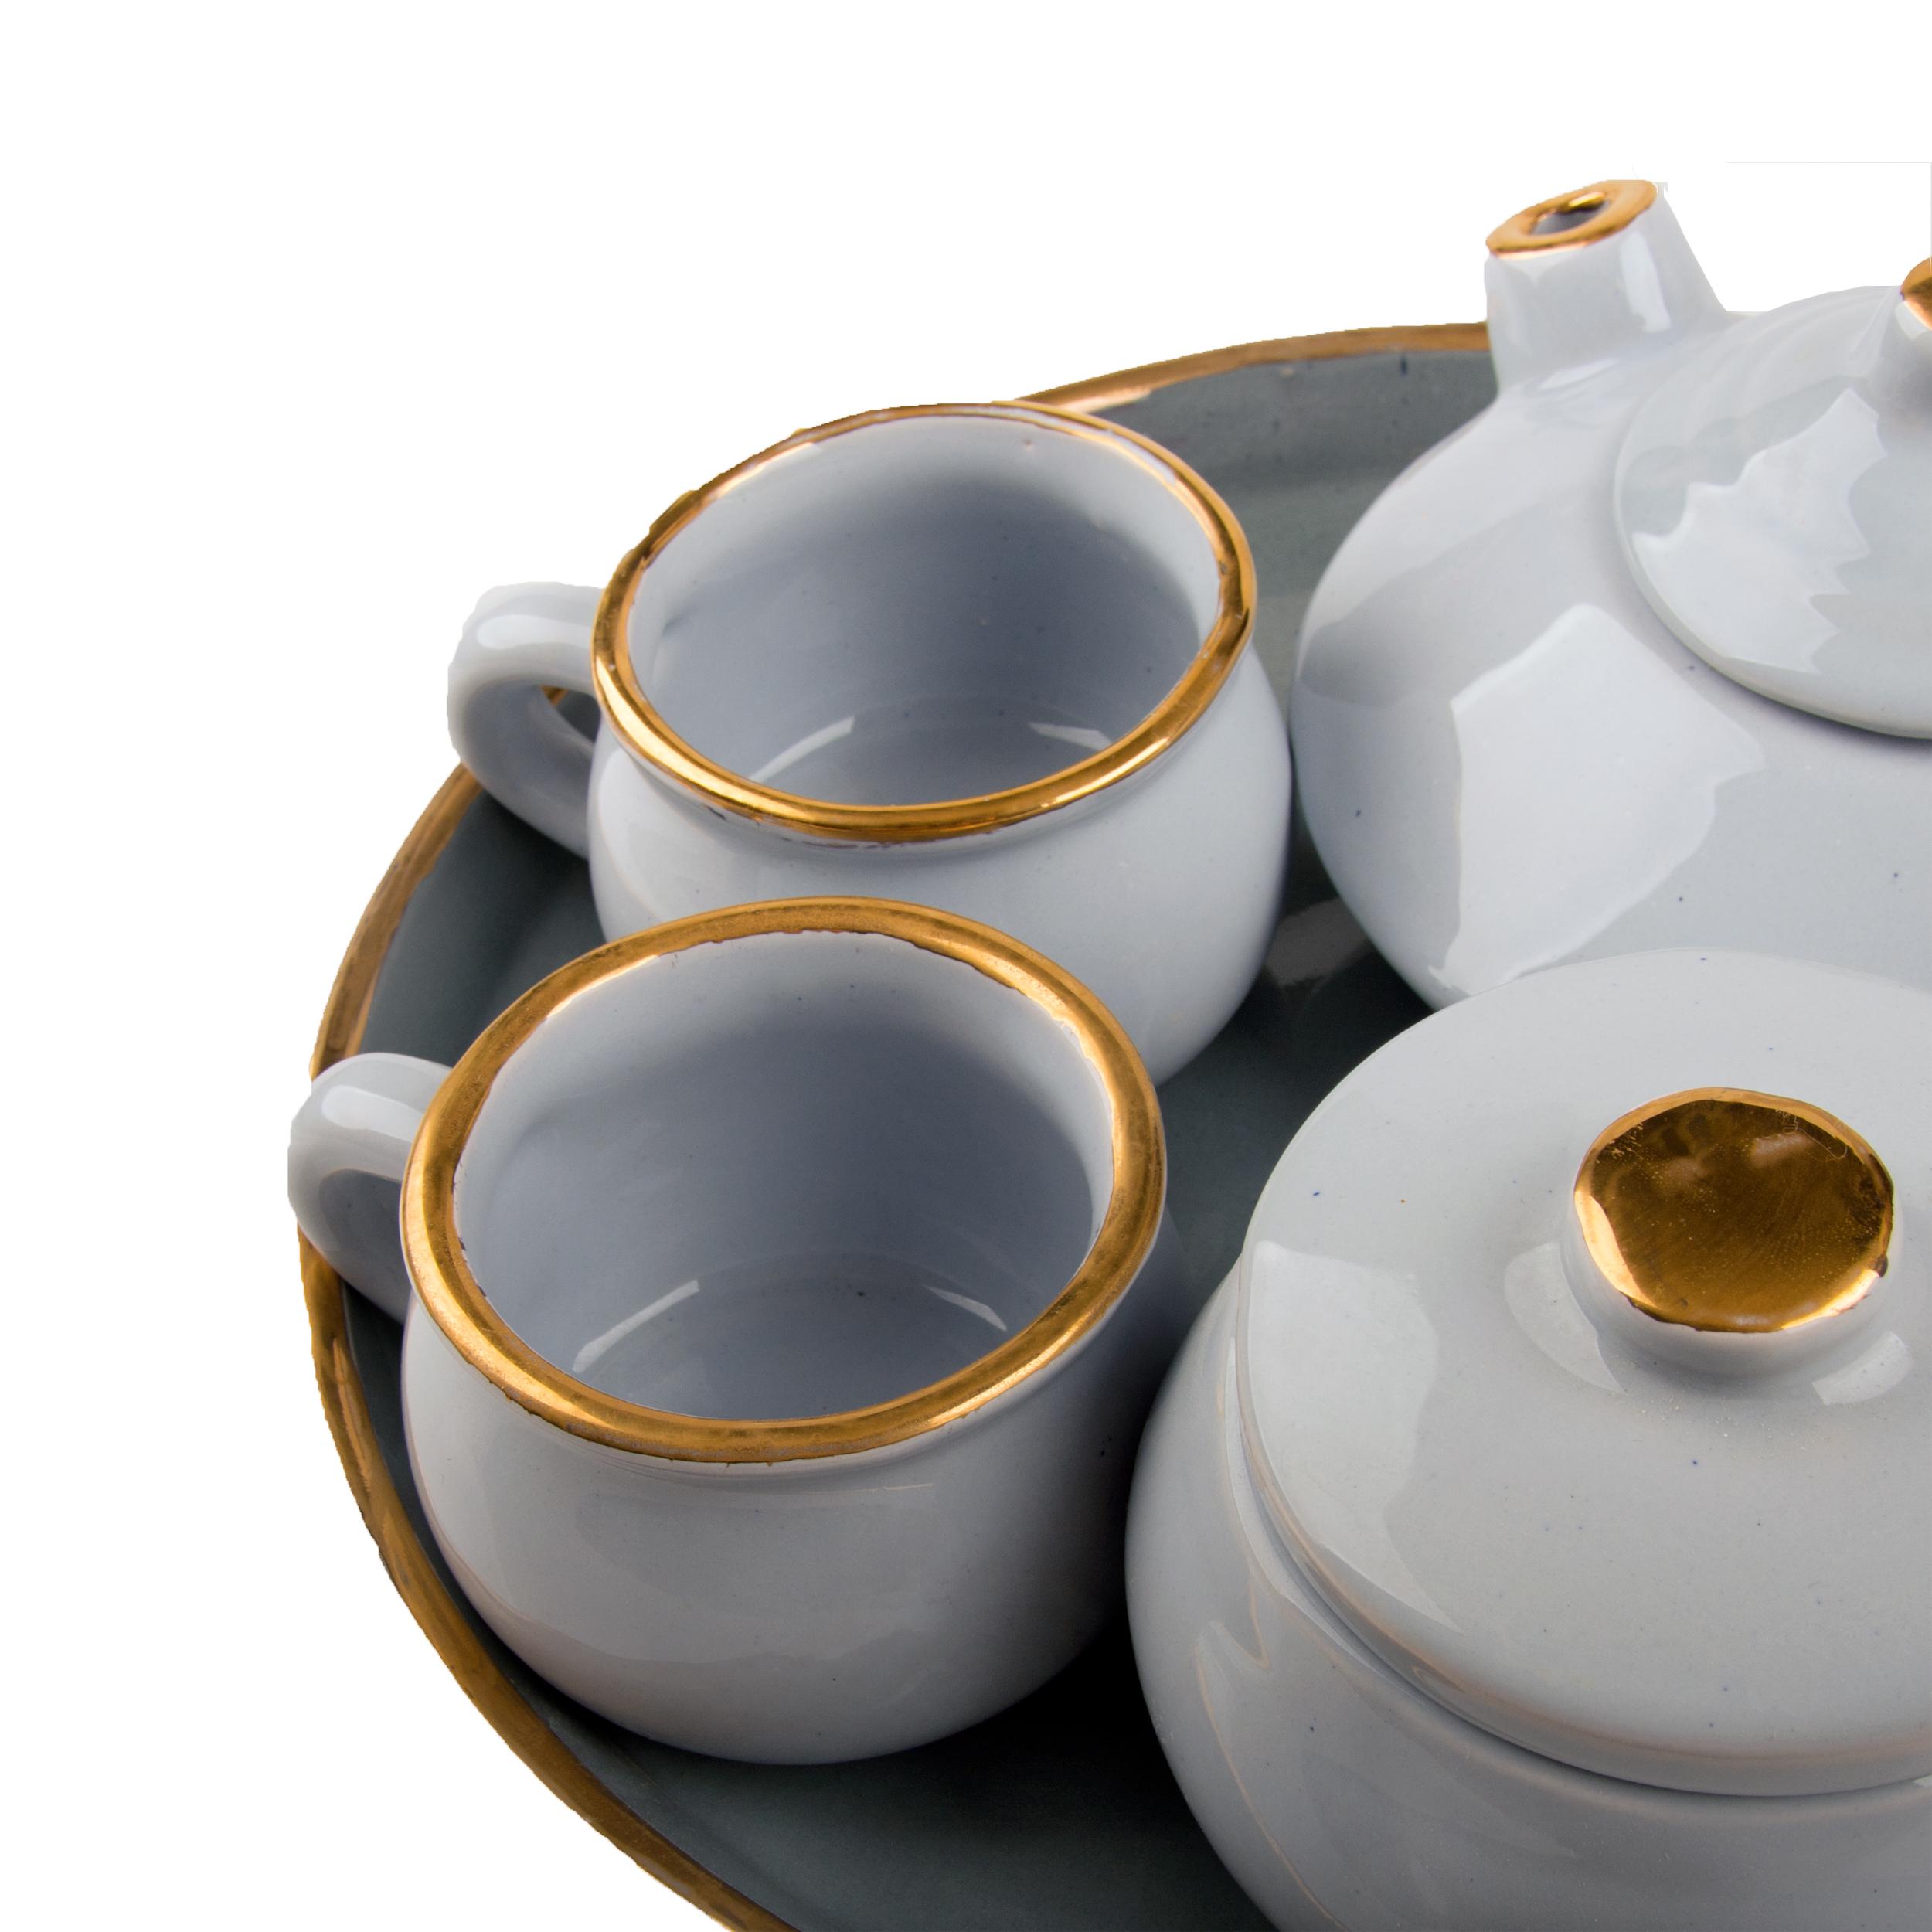 سرویس چای خوری 5 پارچه مدل RO114